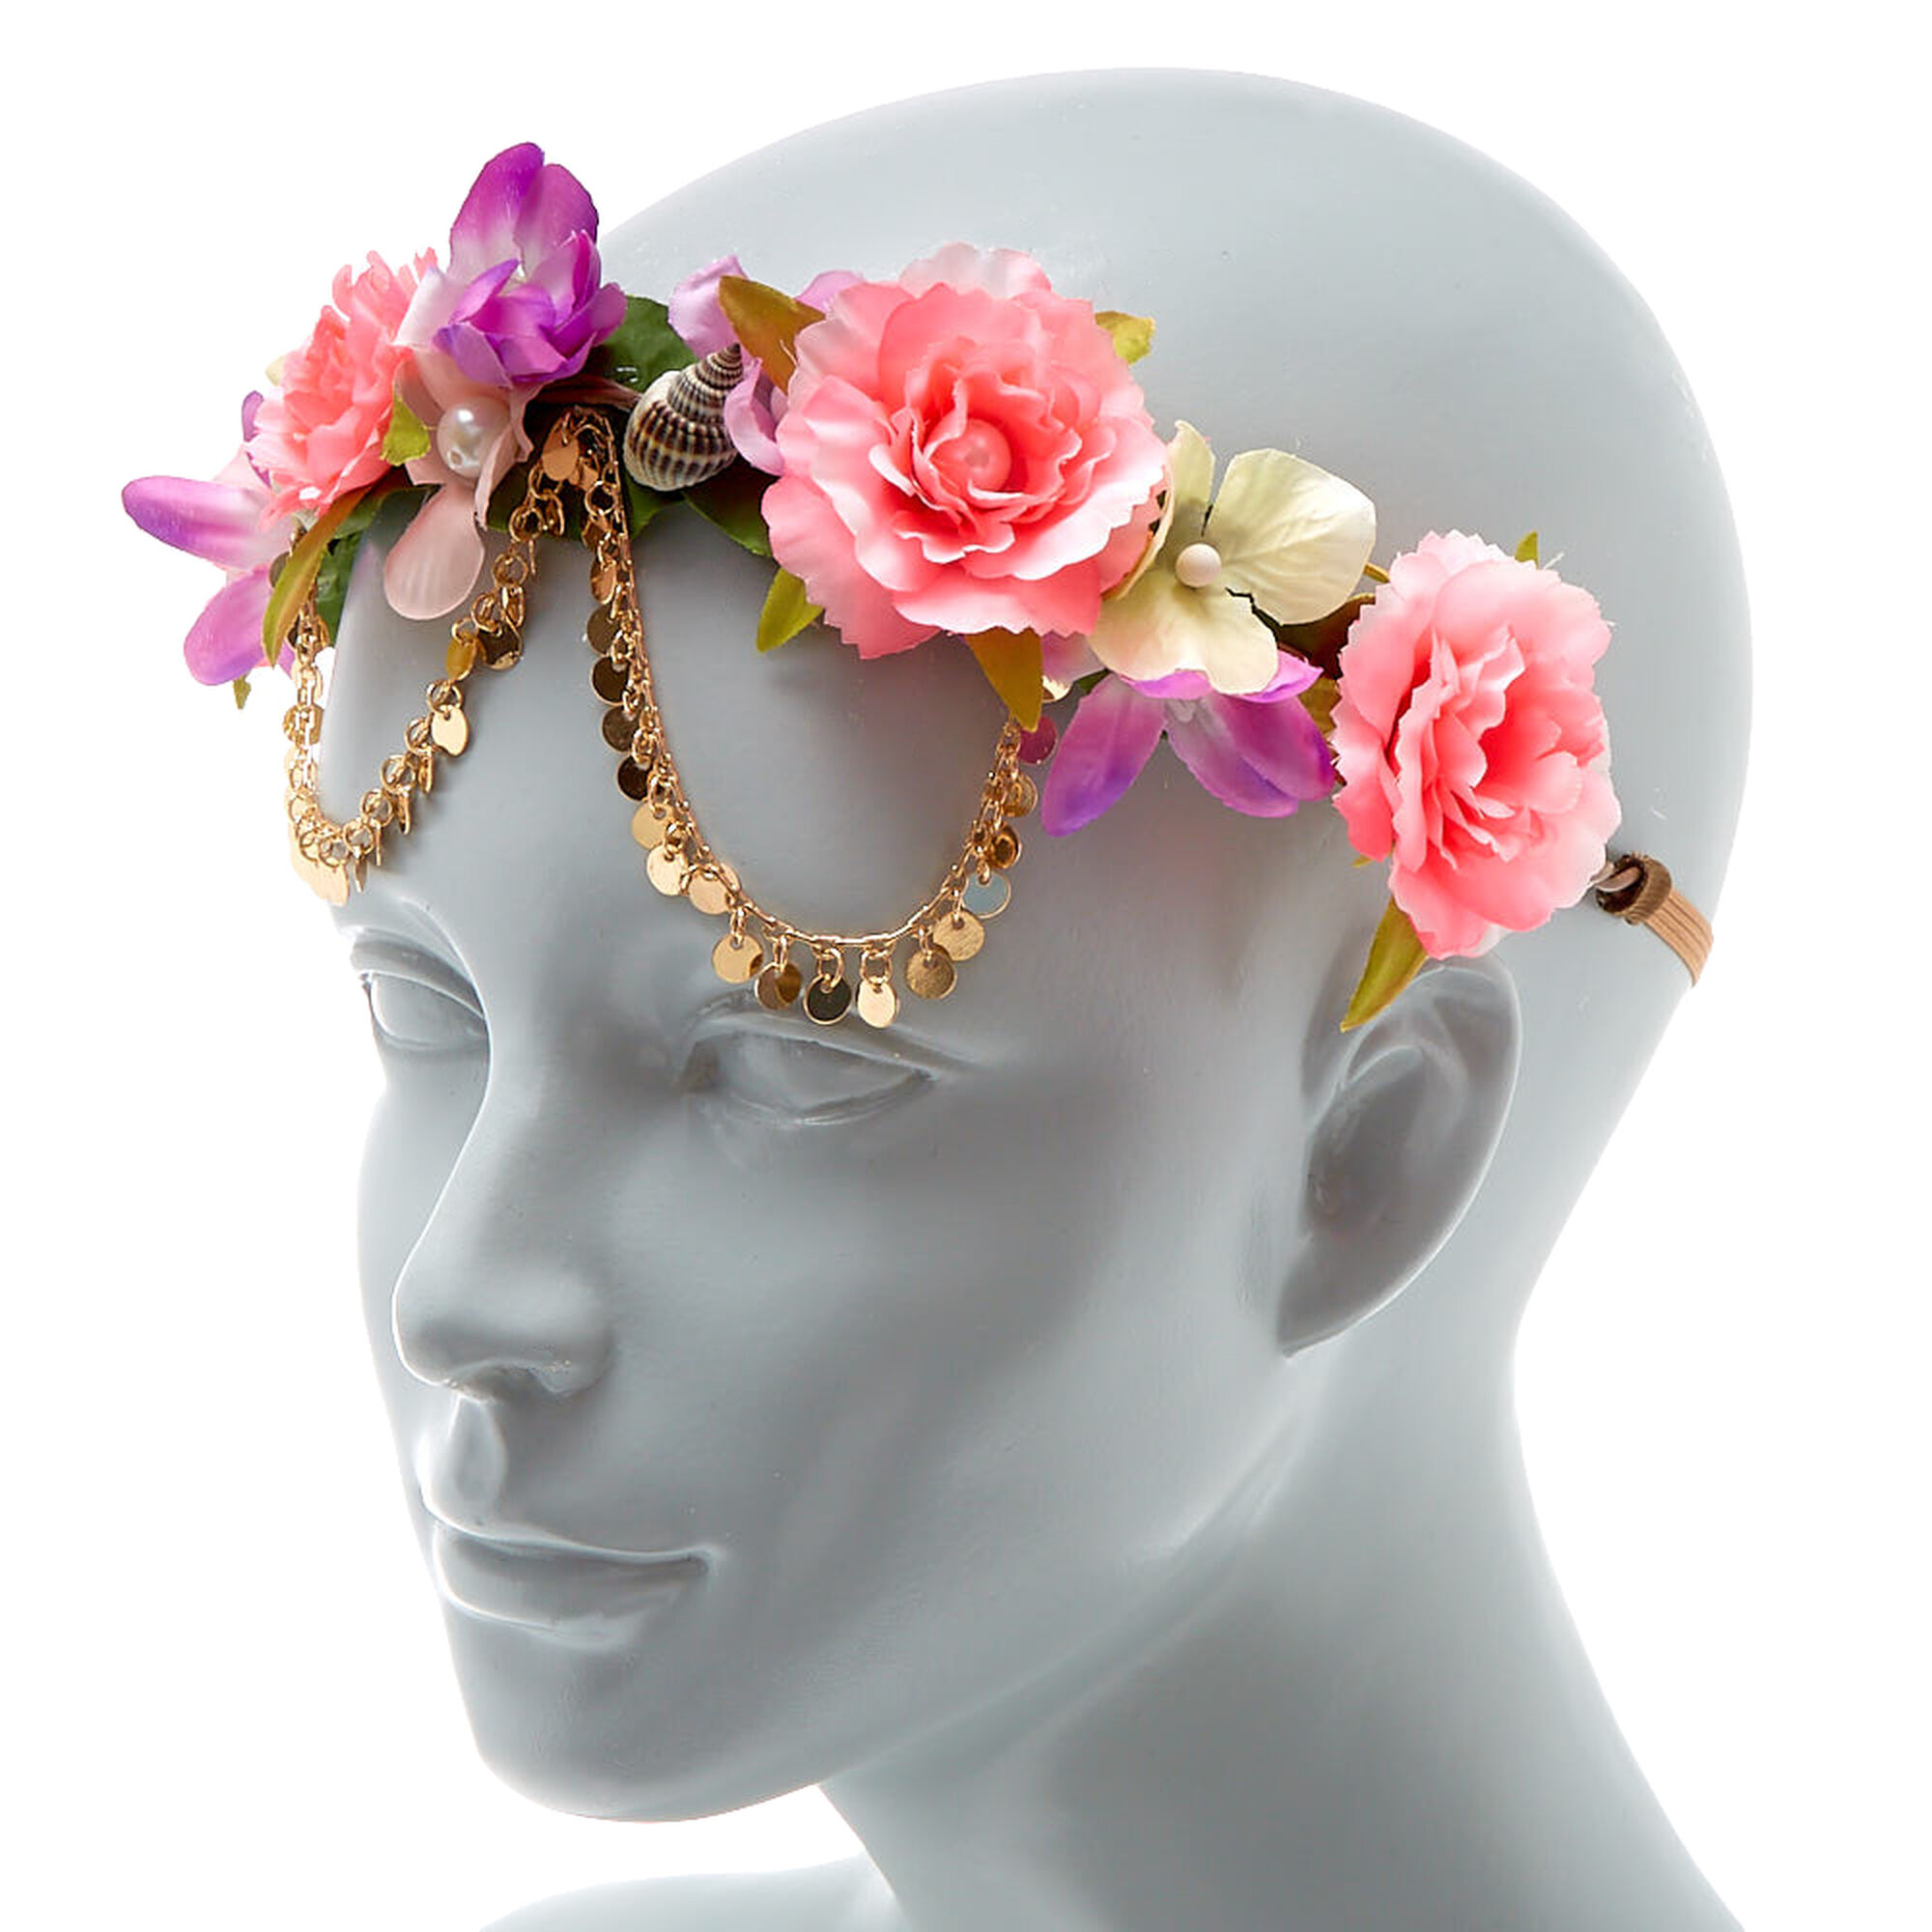 Seashell flower crown headwrap pink icing us seashell flower crown headwrap pink izmirmasajfo